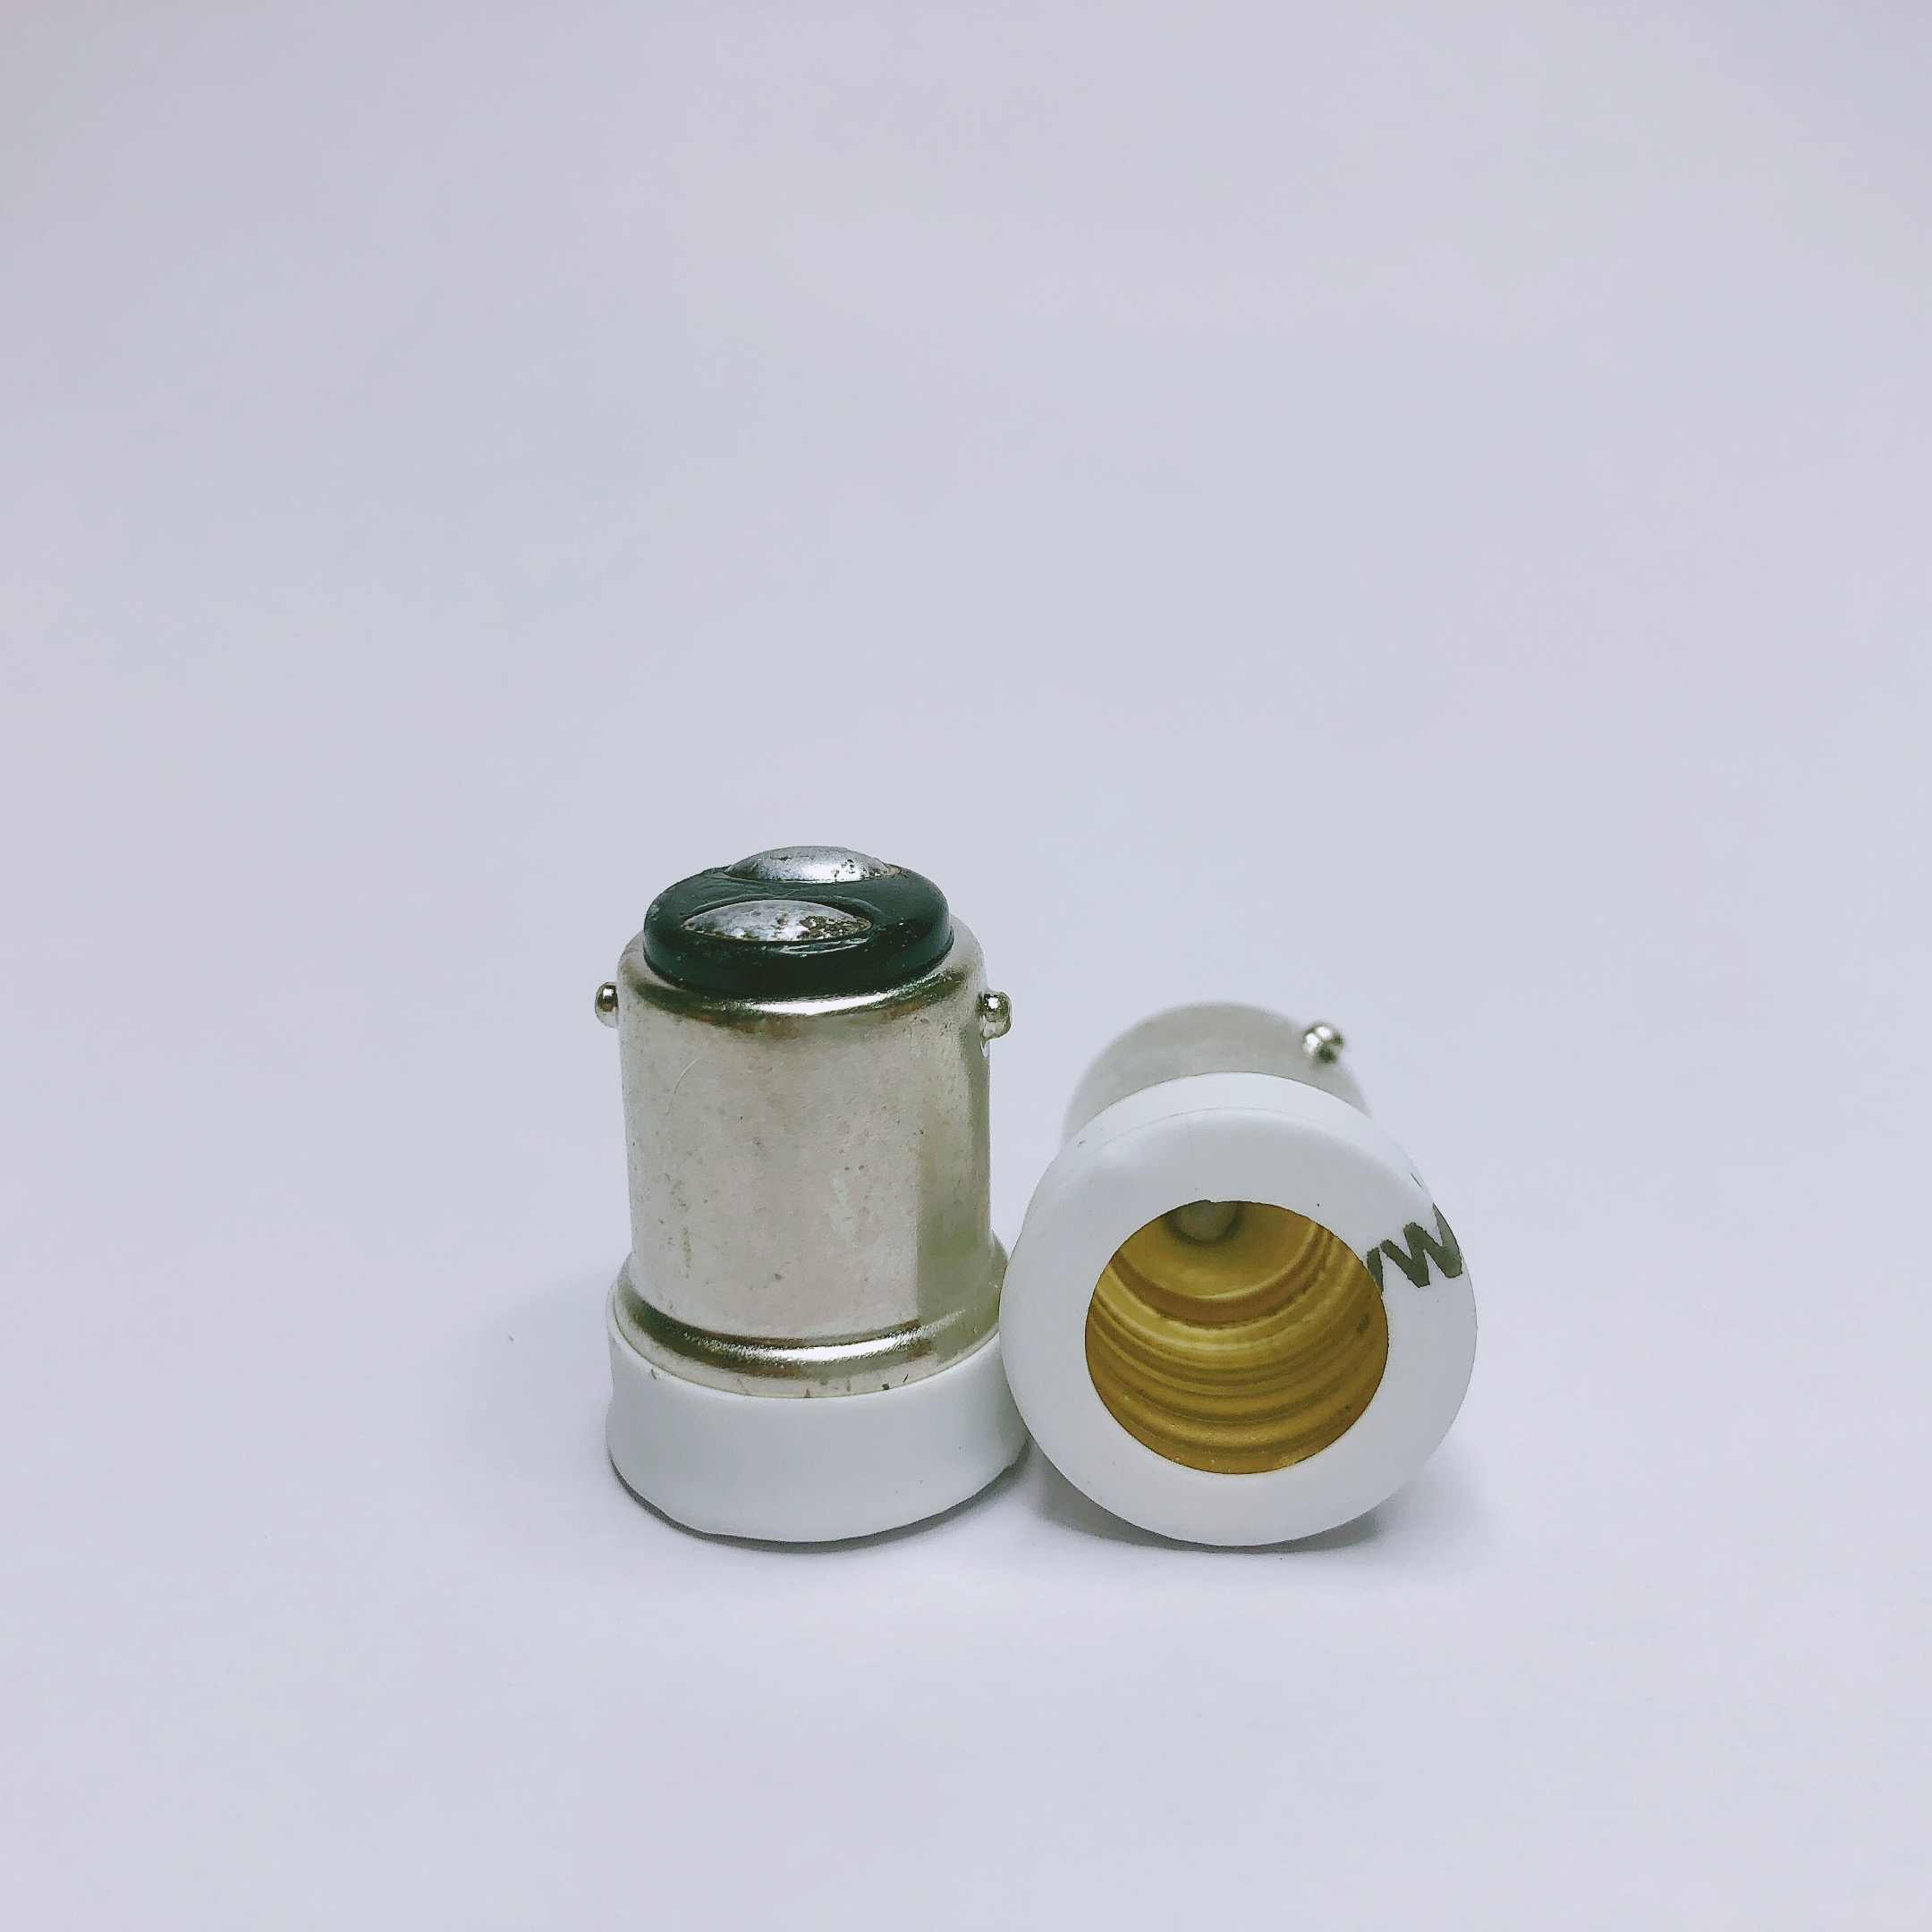 B15 זכר E14 נקבה מנורת הנורה שקע אור Extender מתאם ממיר מחזיק ספינת ירידת תמיכה